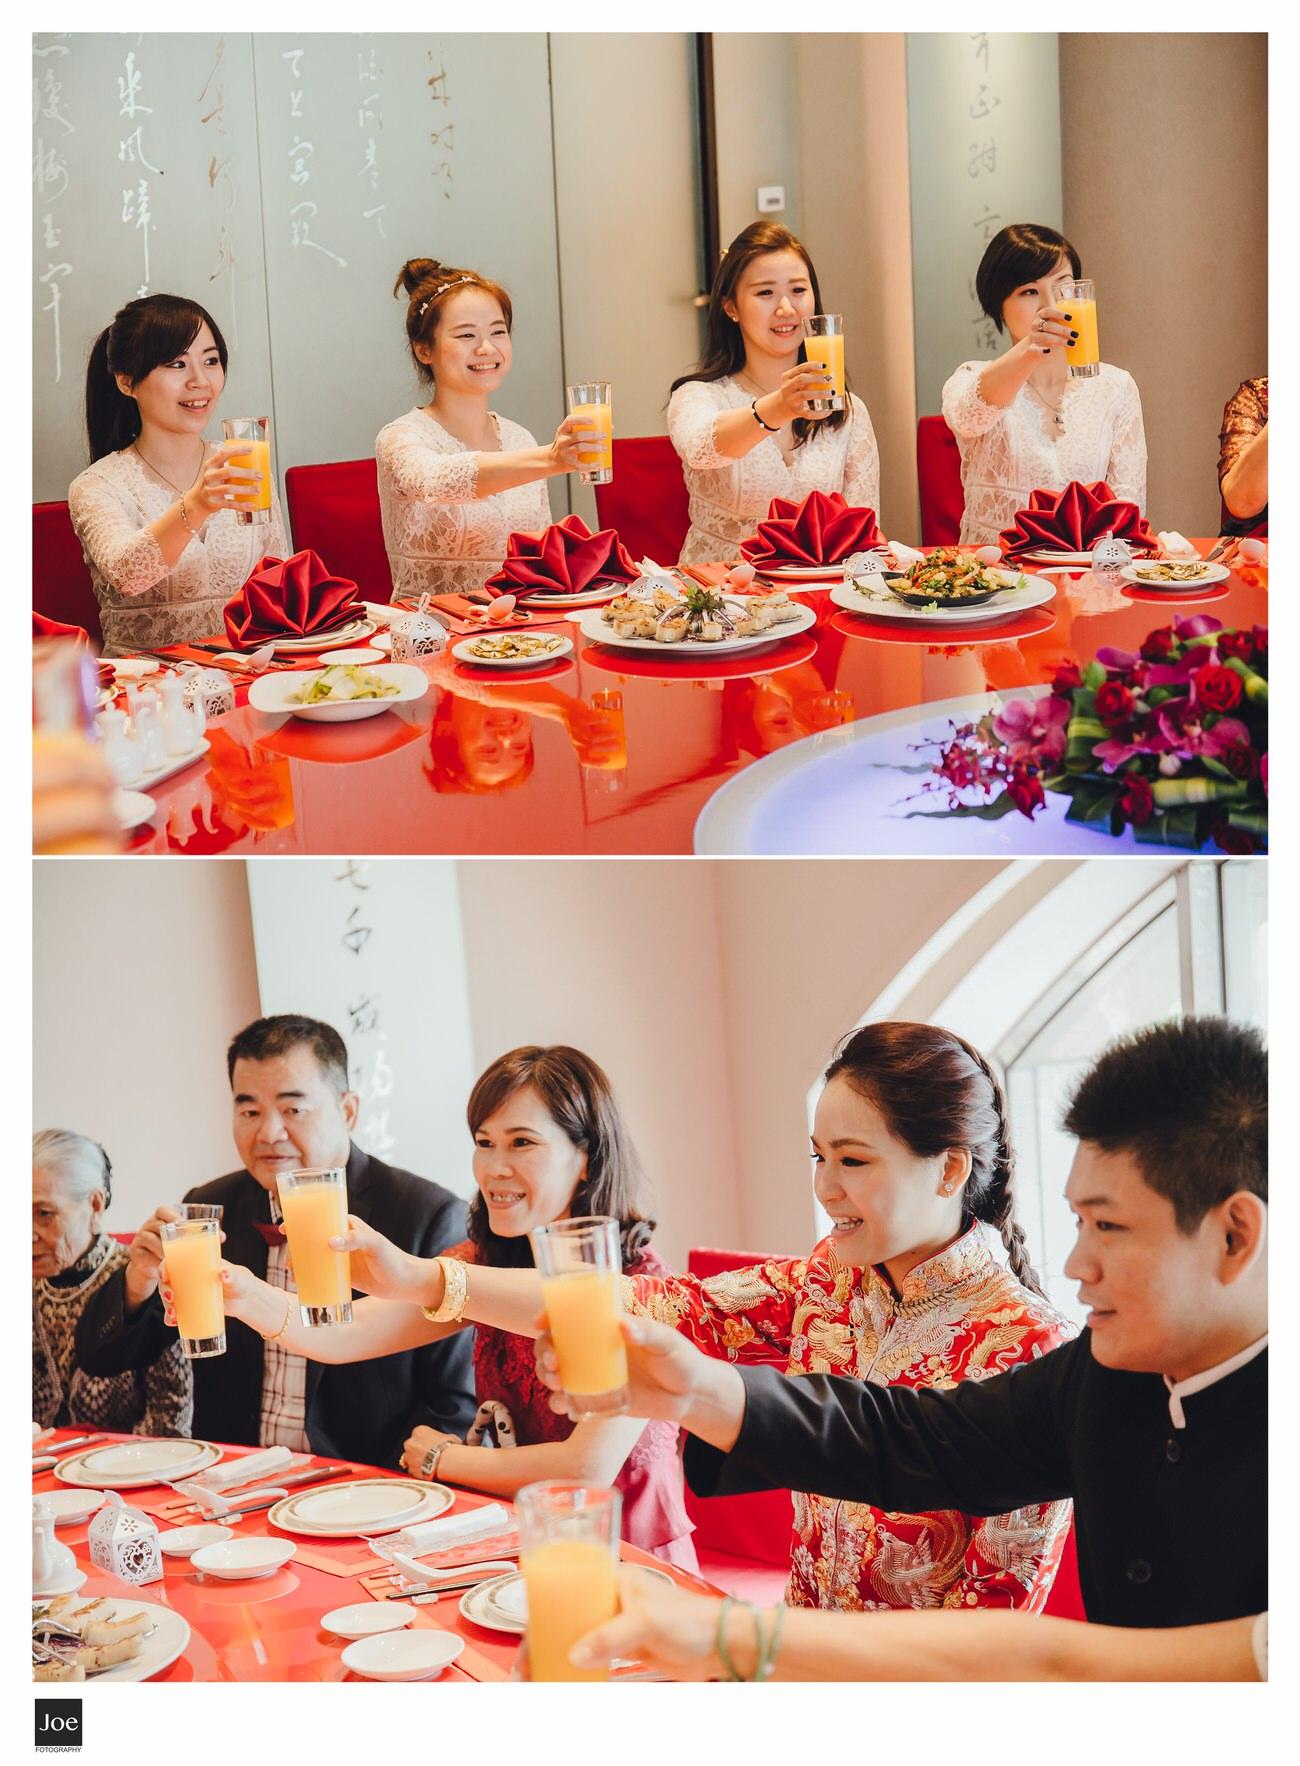 grand-hilai-hotel-wedding-daniel-yvette-joe-fotography-048.jpg